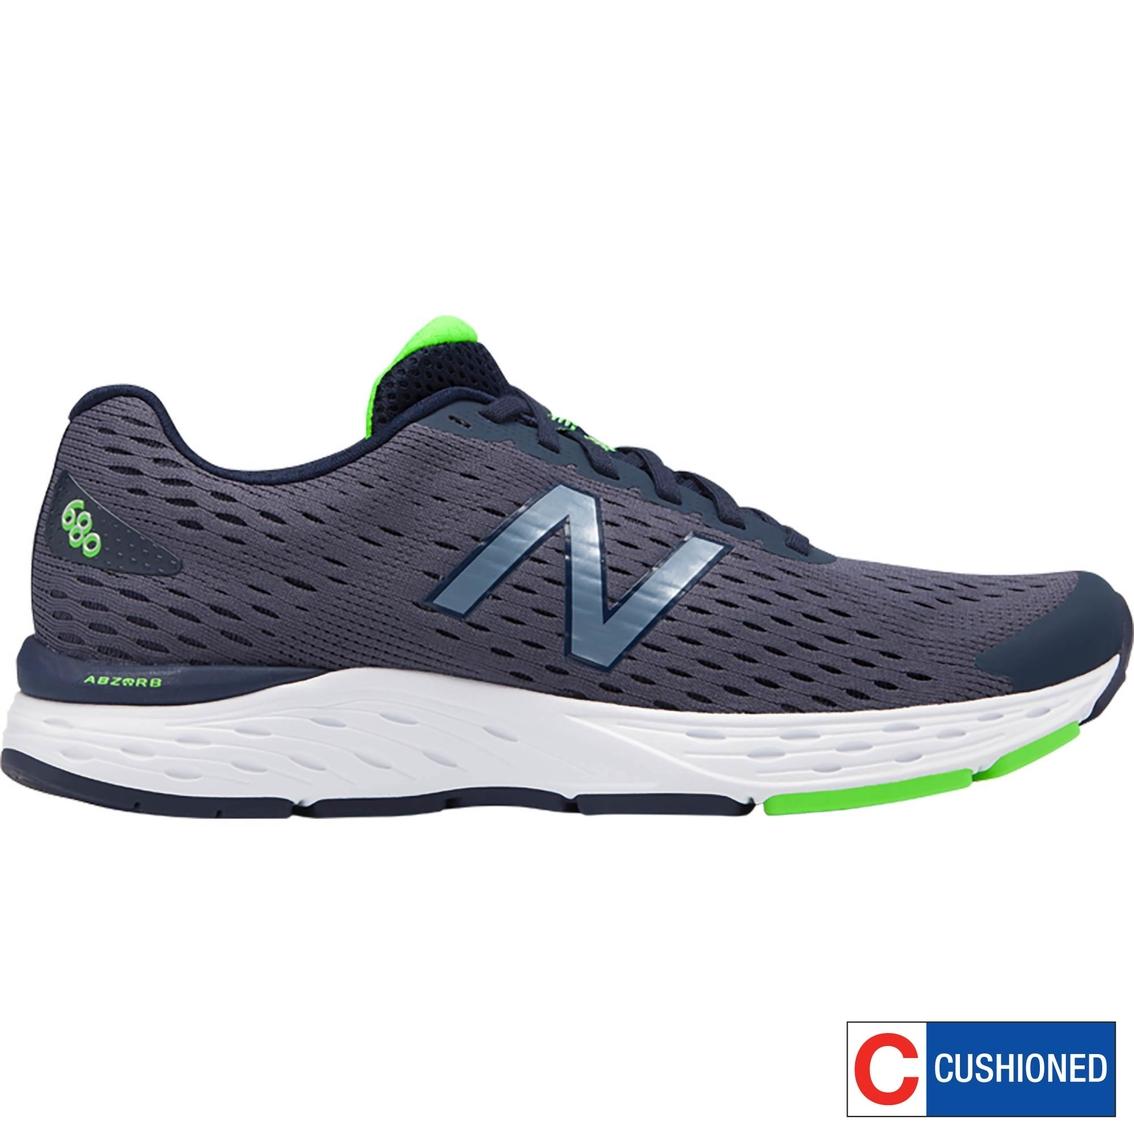 d5aeebd4b73c7 New Balance Men's M680ln6 Running Shoes | Running | Shoes | Shop The ...